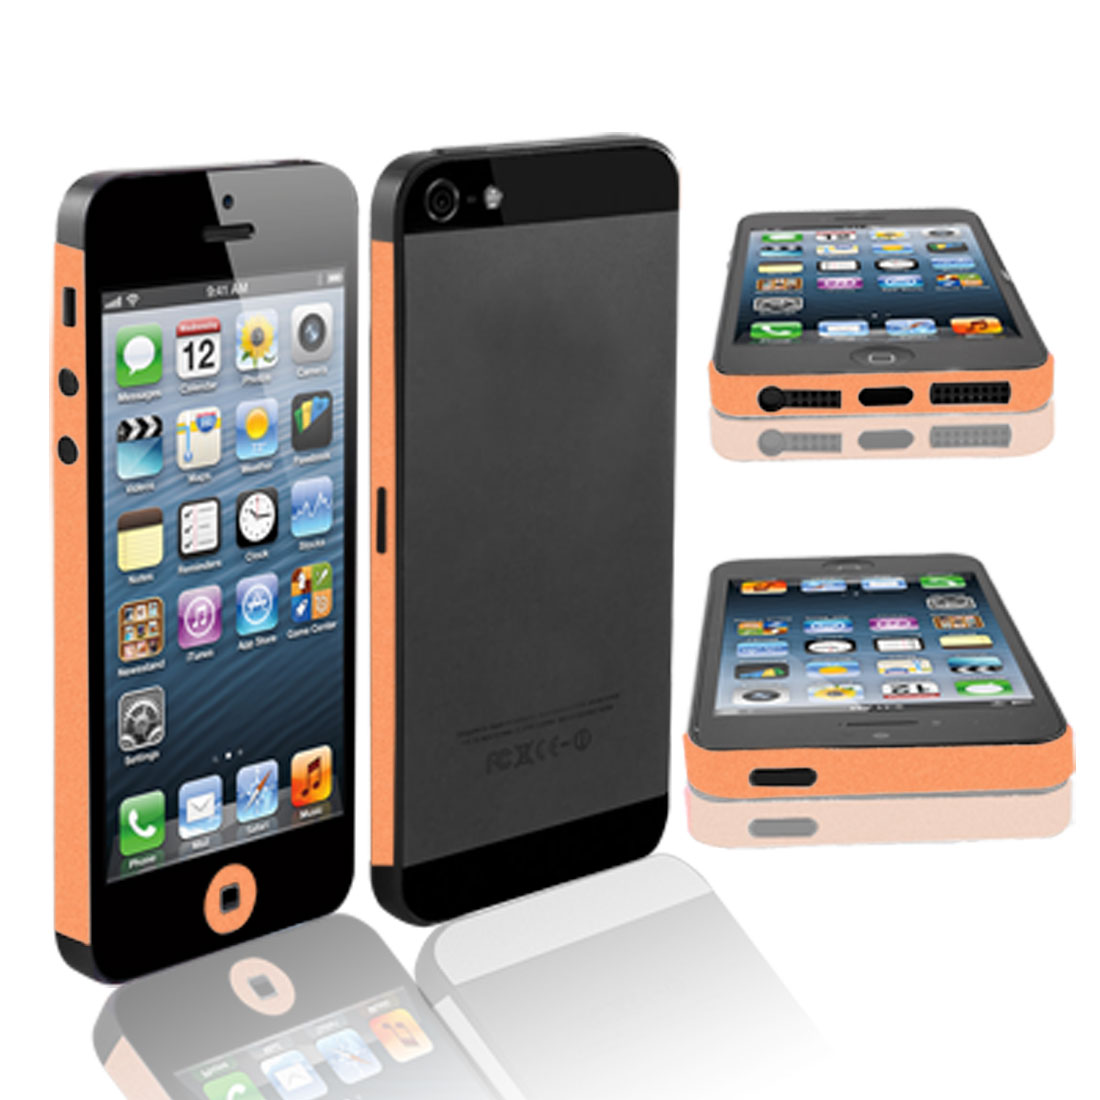 Unique Bargains Orange Vinyl Frame Side Edge Wrap Decal Skin Sticker for iPhone 5 5G 5th